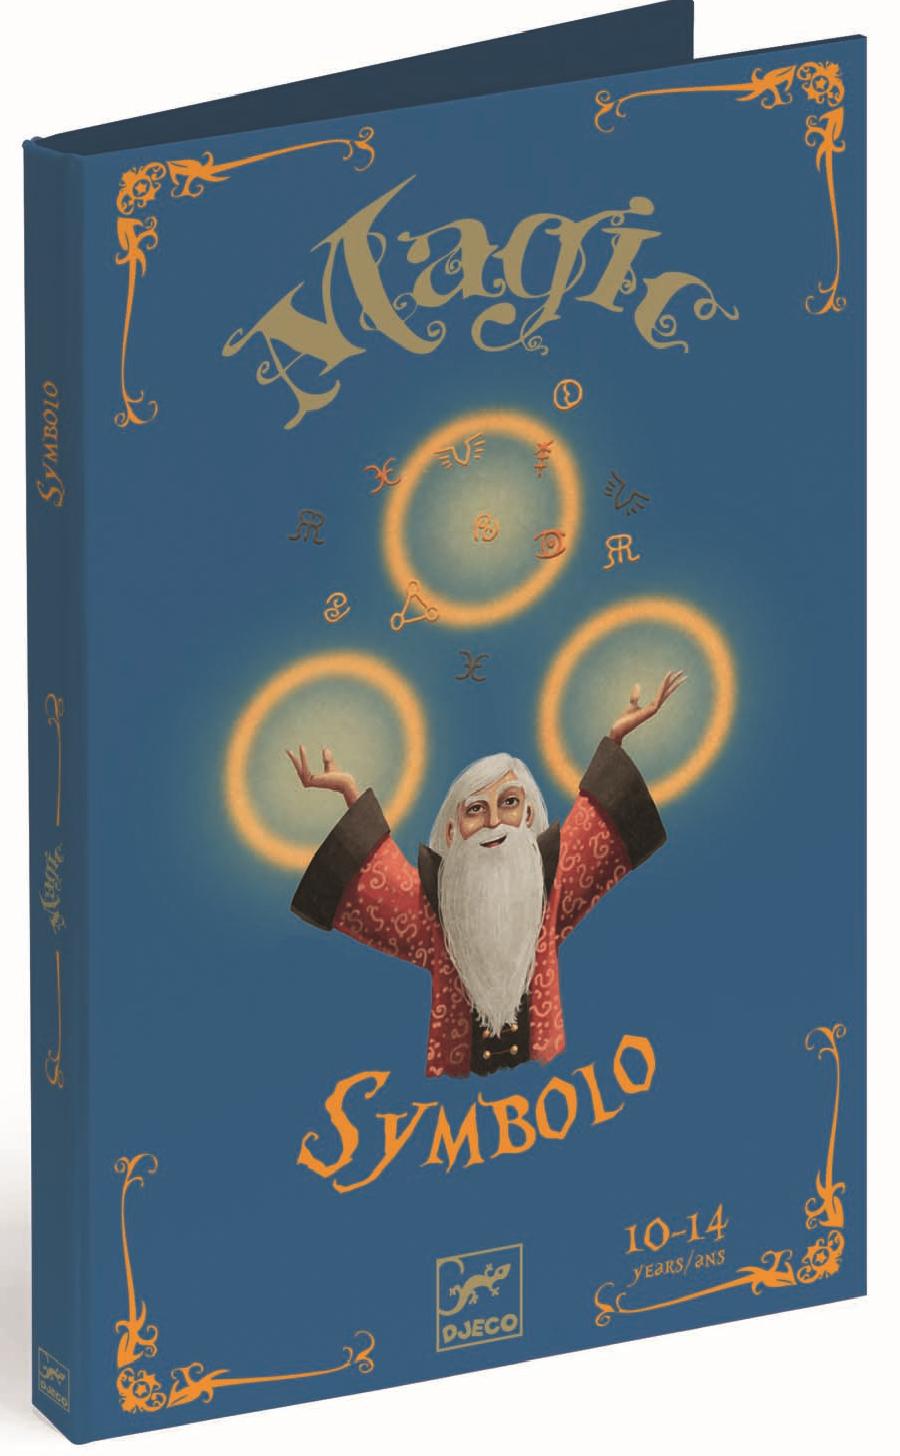 Joc de magie symbolo djeco